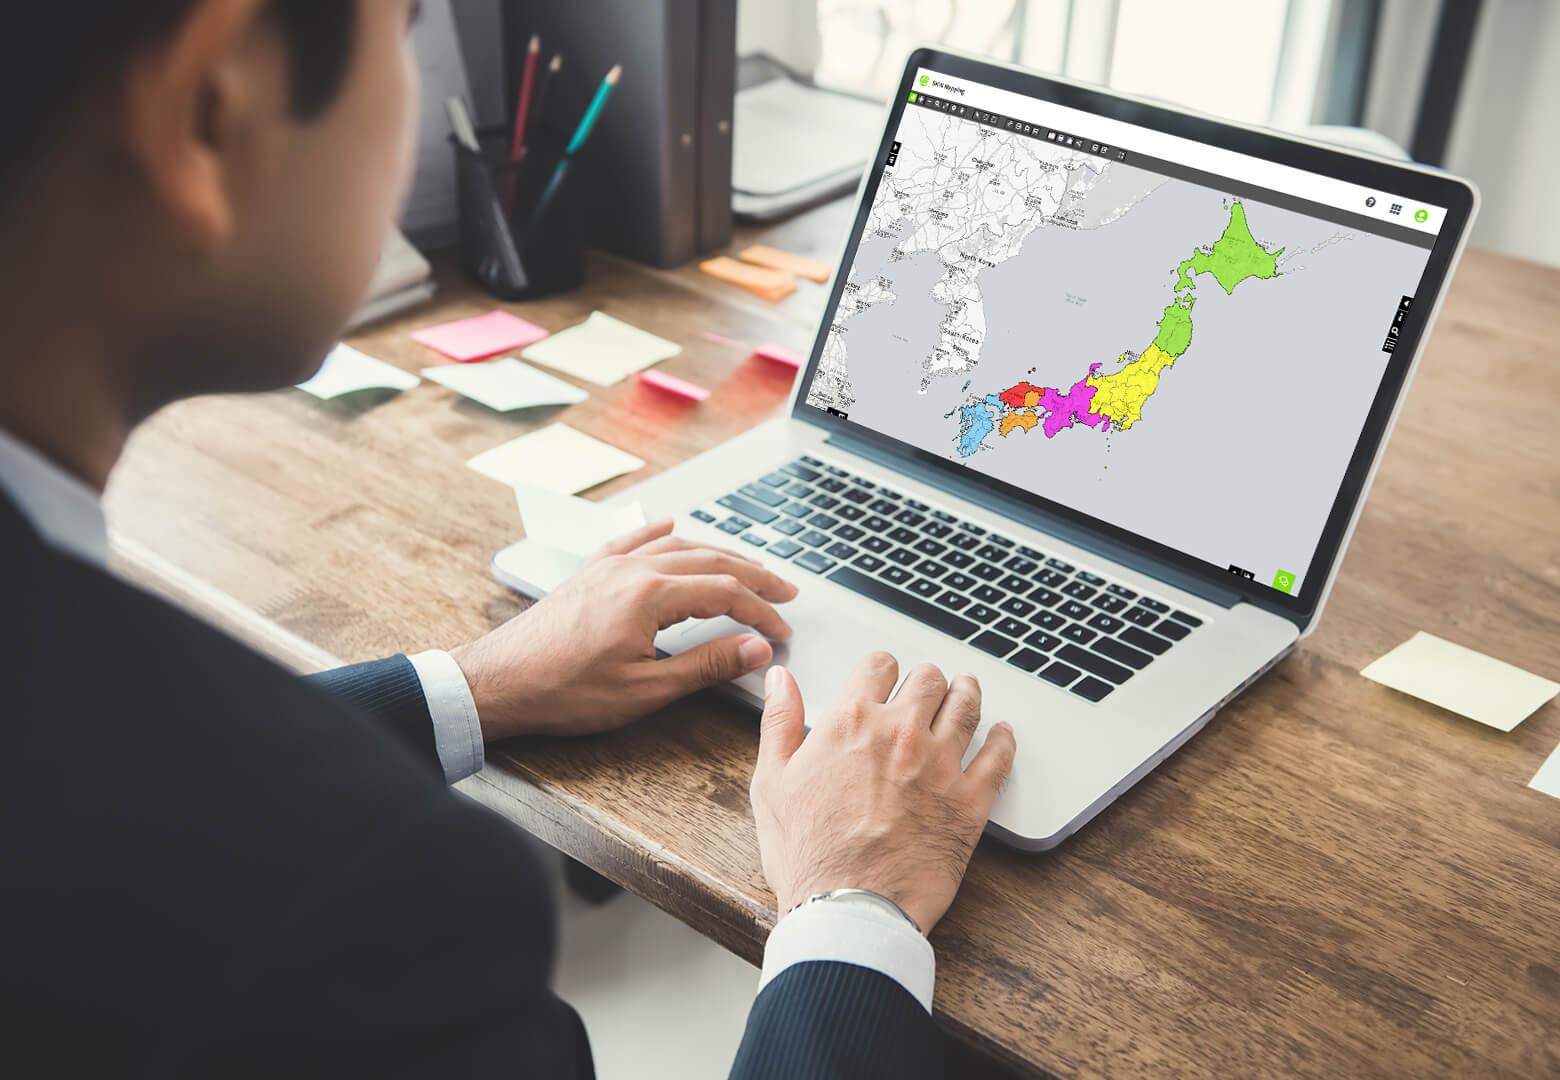 creating territories map on laptop